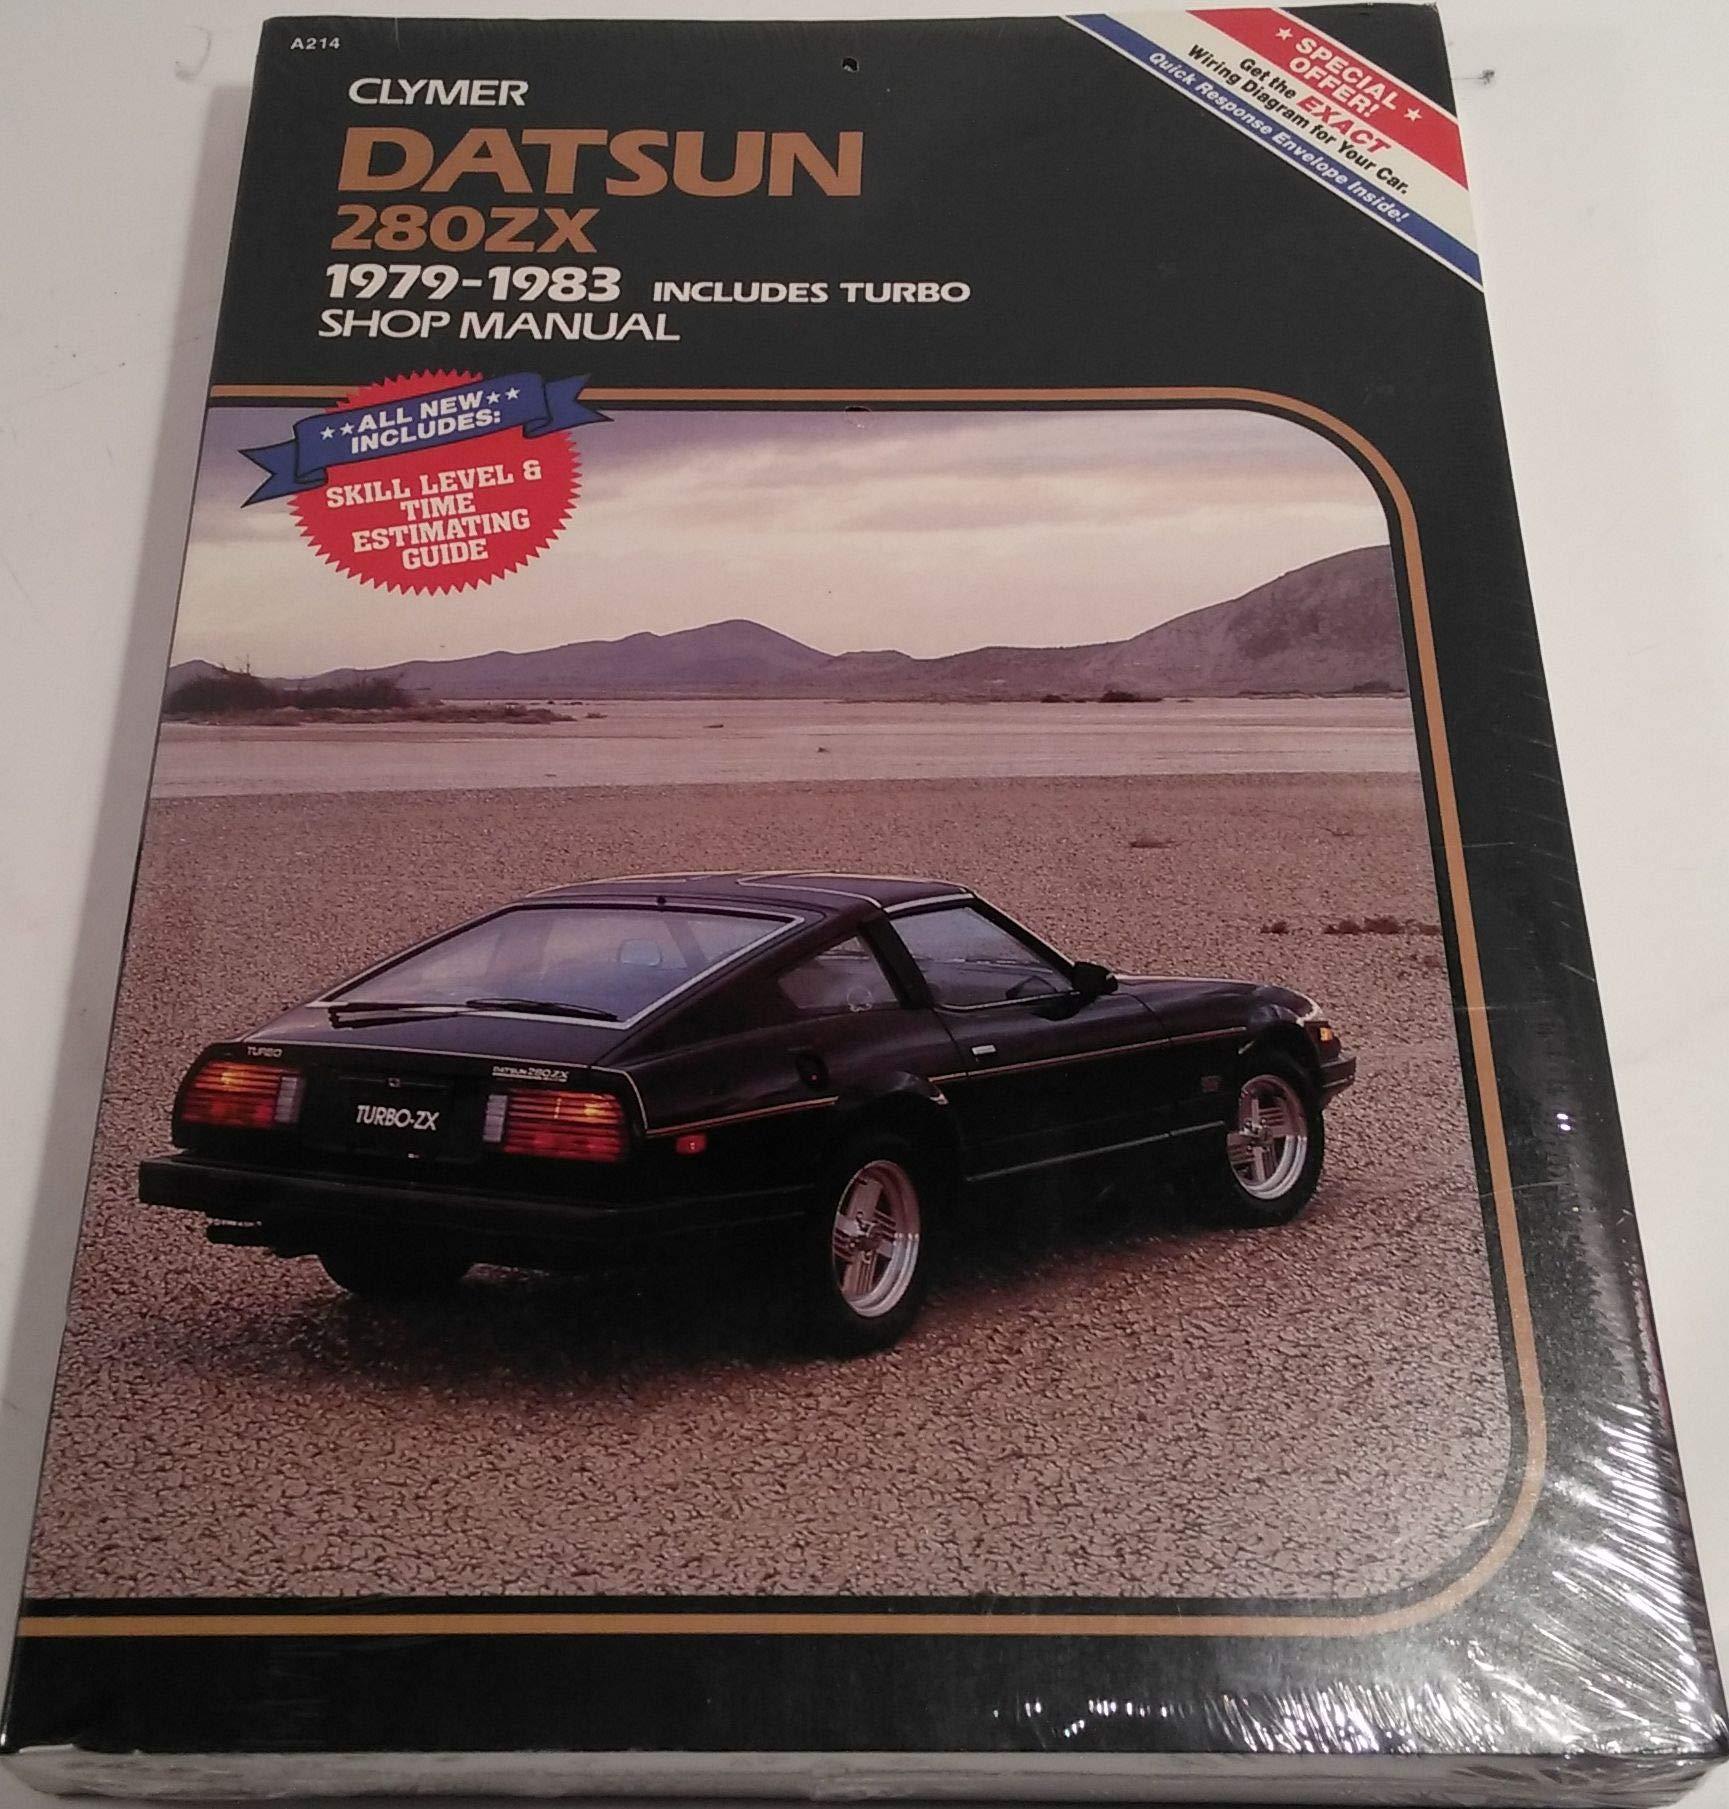 Datsun 280zx 1979 1983 Includes Turbo Shop Manual Wiring Diagrams Alan Ahlstrand Fremdsprachige Bcher